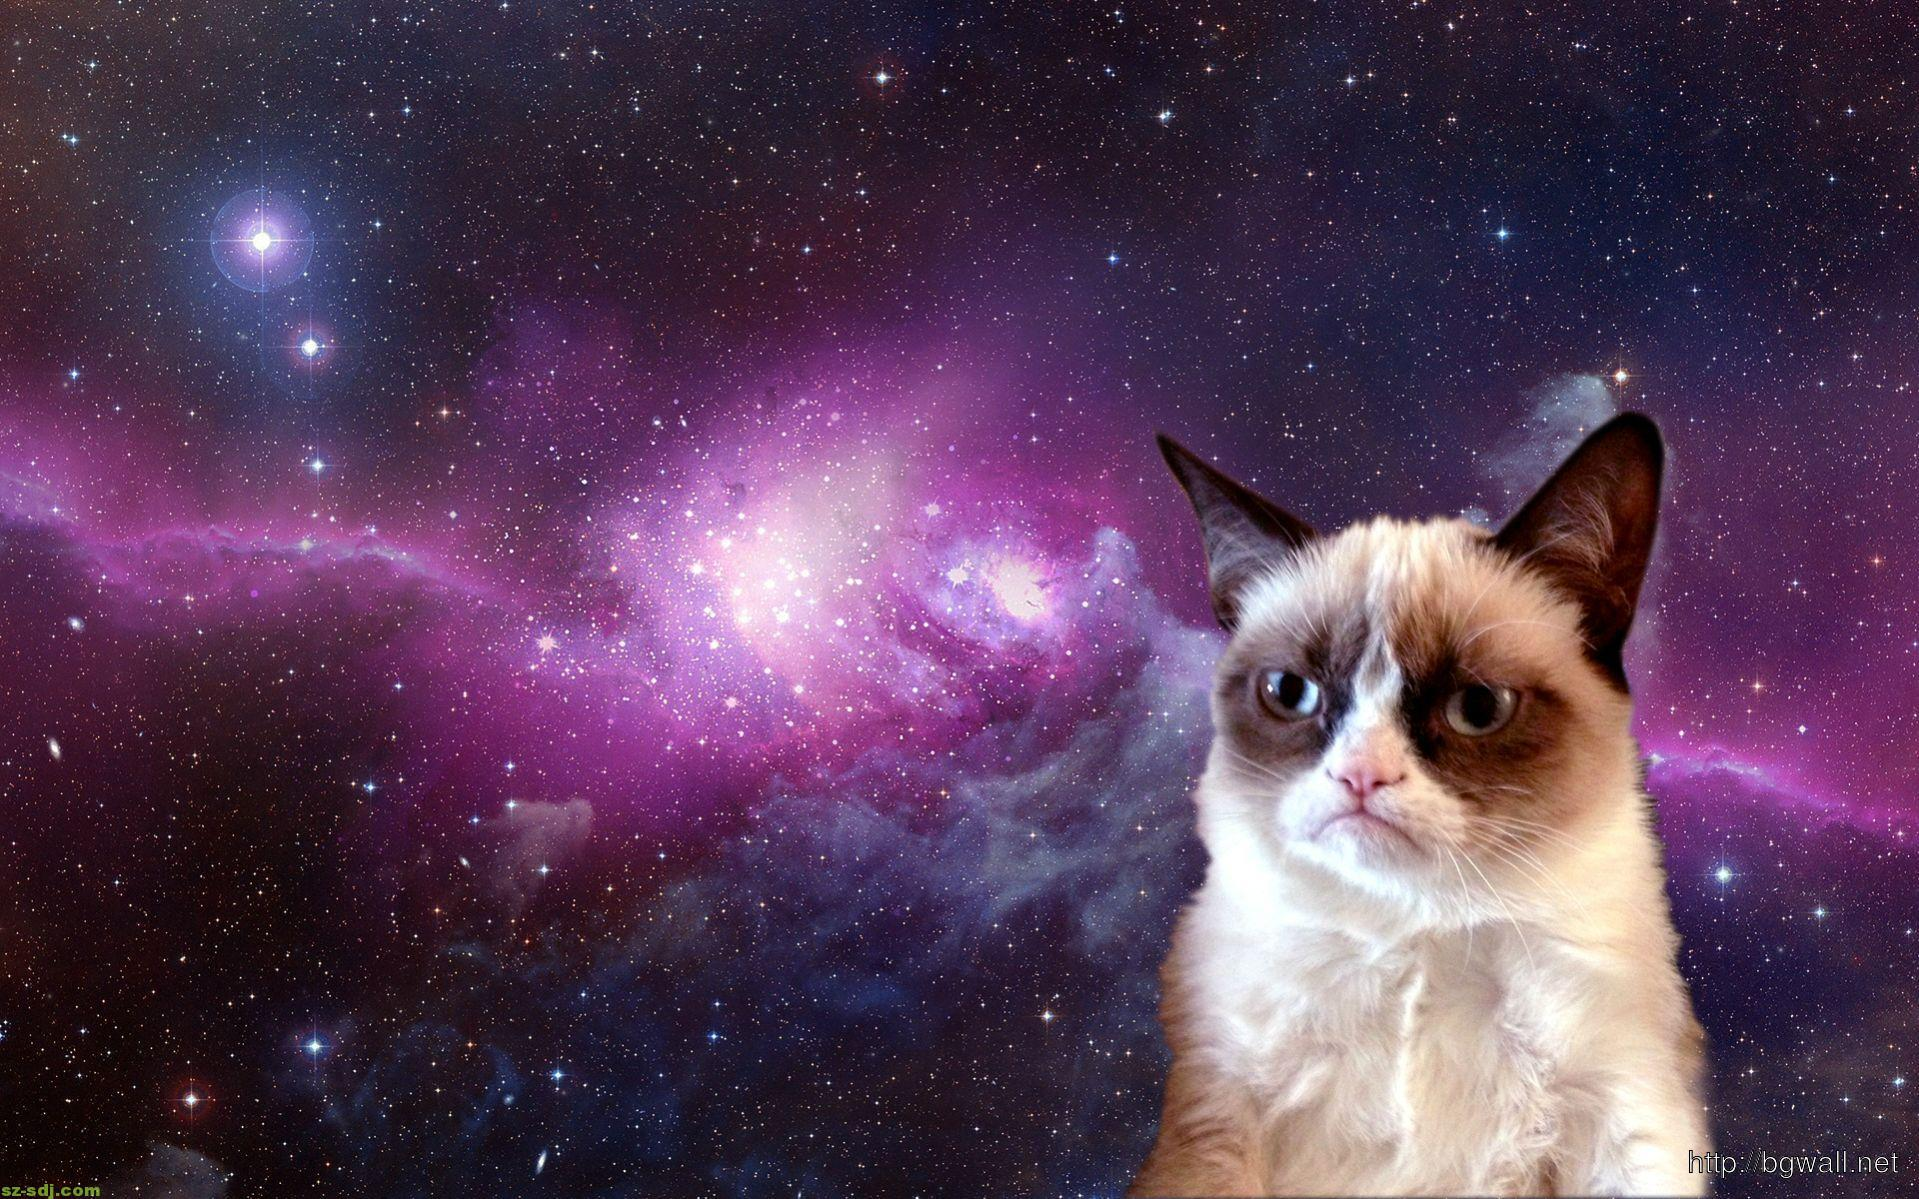 grumpy-cat-at-space-images-wallpaper-pc-desktop